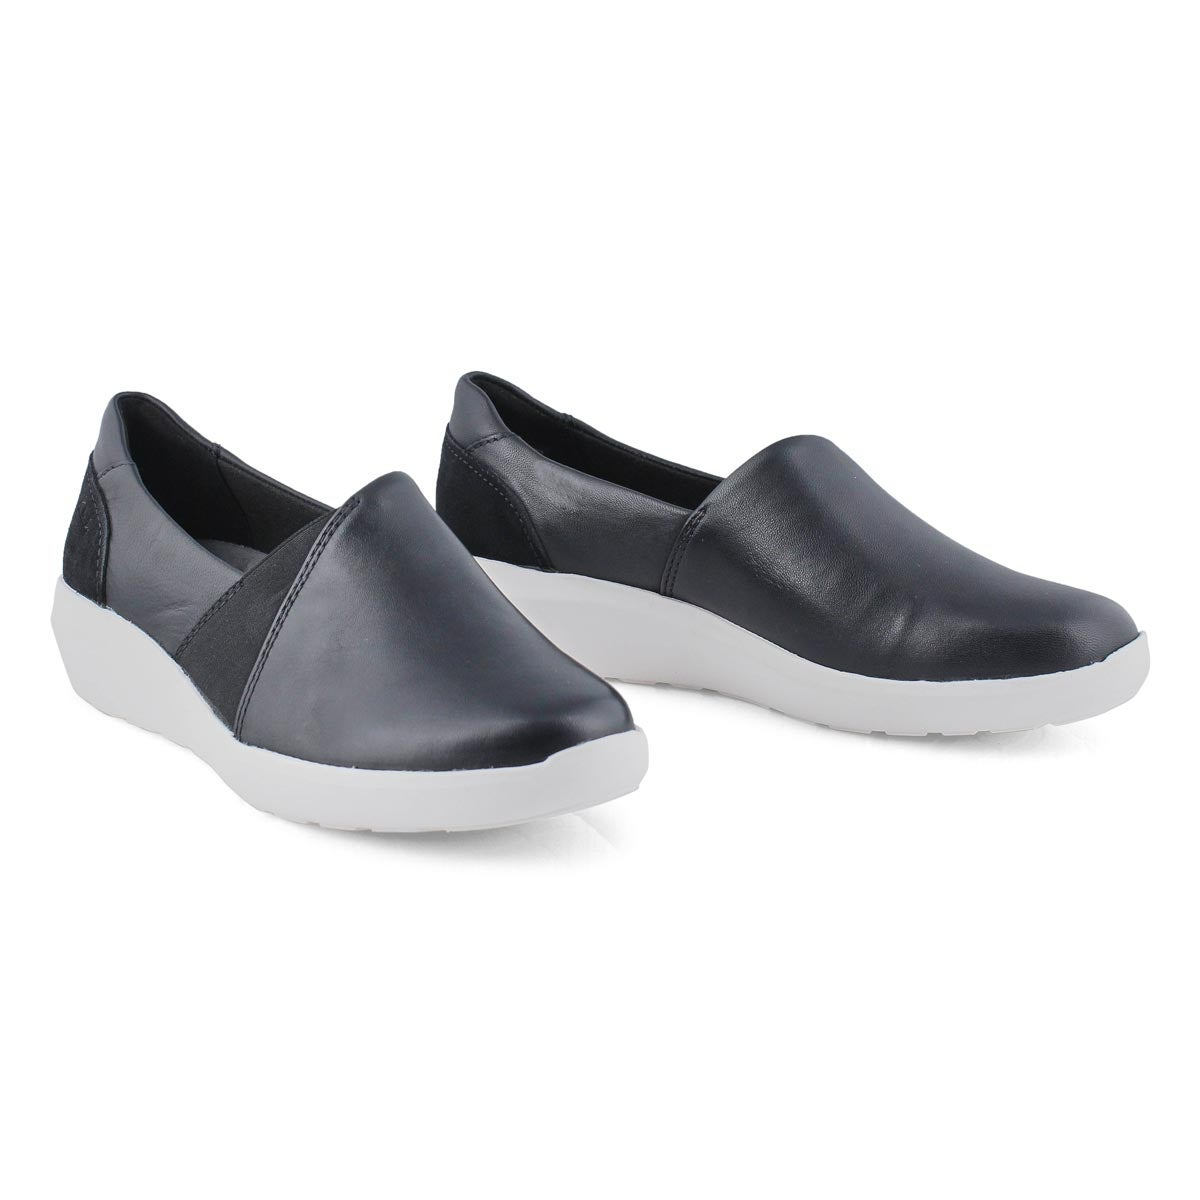 Lds Kayleigh Step black slip on shoe